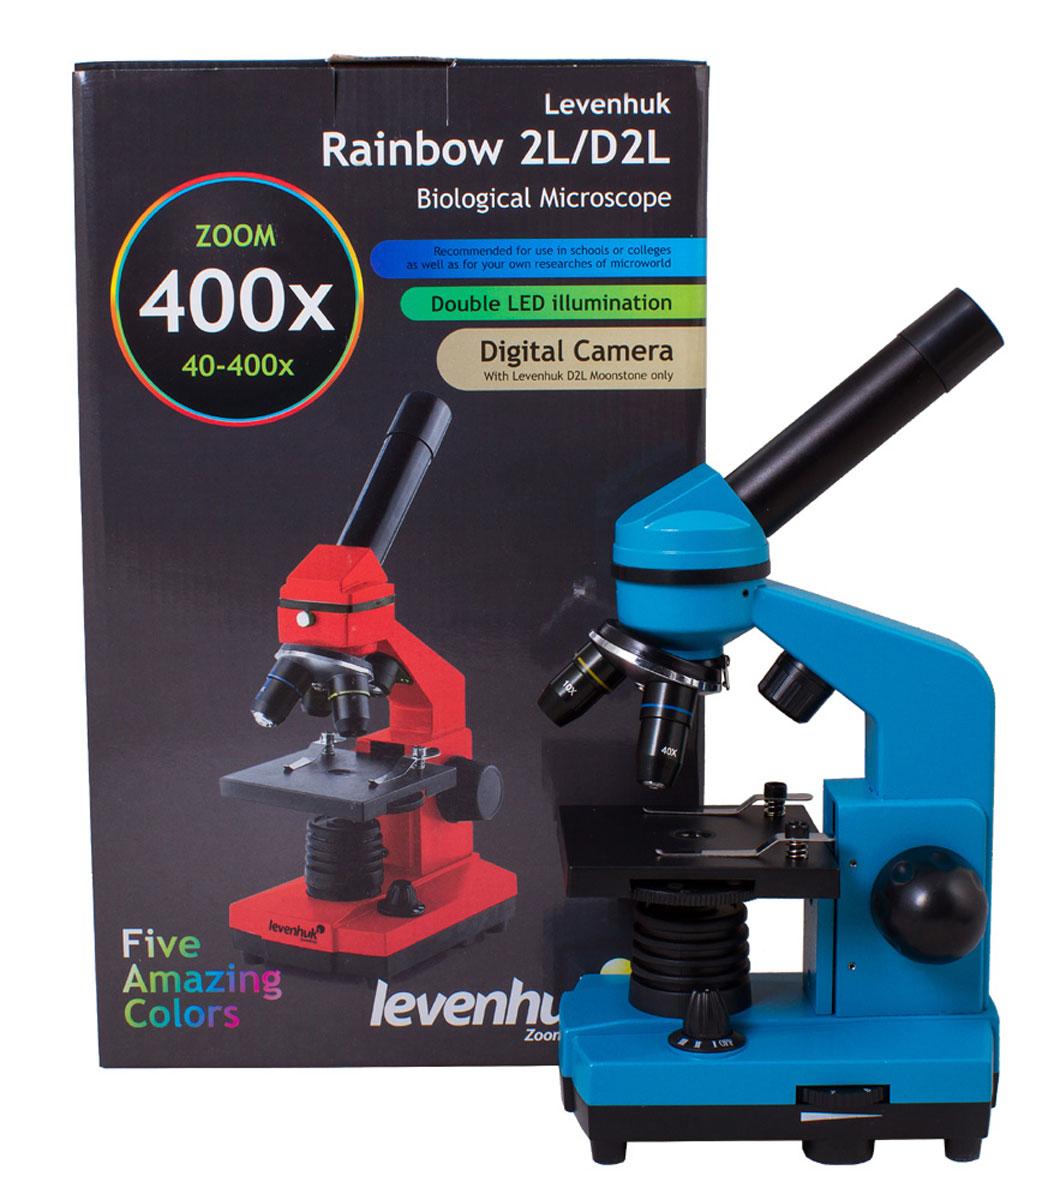 Levenhuk Rainbow 2L, Azureмикроскоп Levenhuk